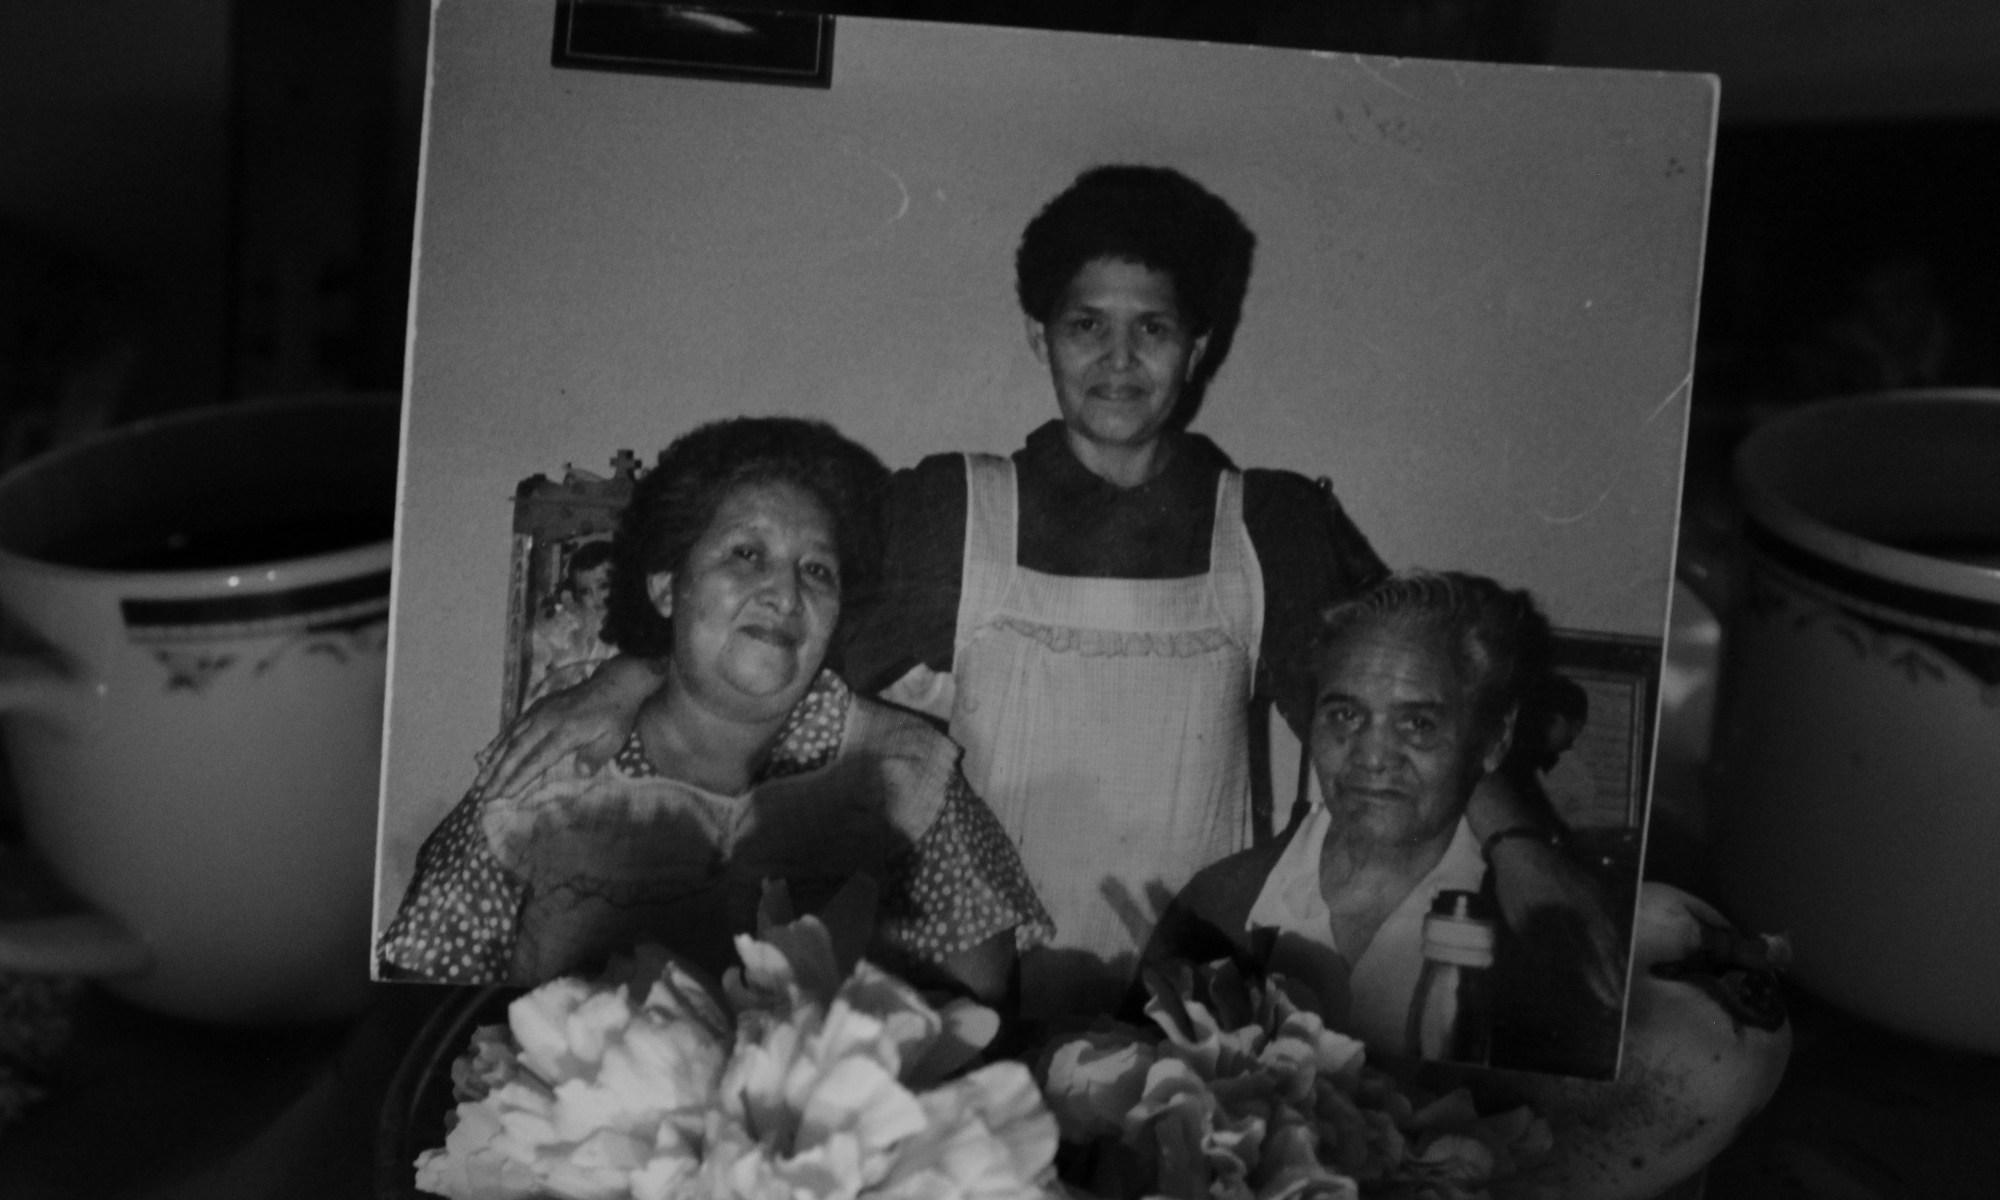 La-muerte-de-mi-abuela-durante-la-pandemia-covid-19